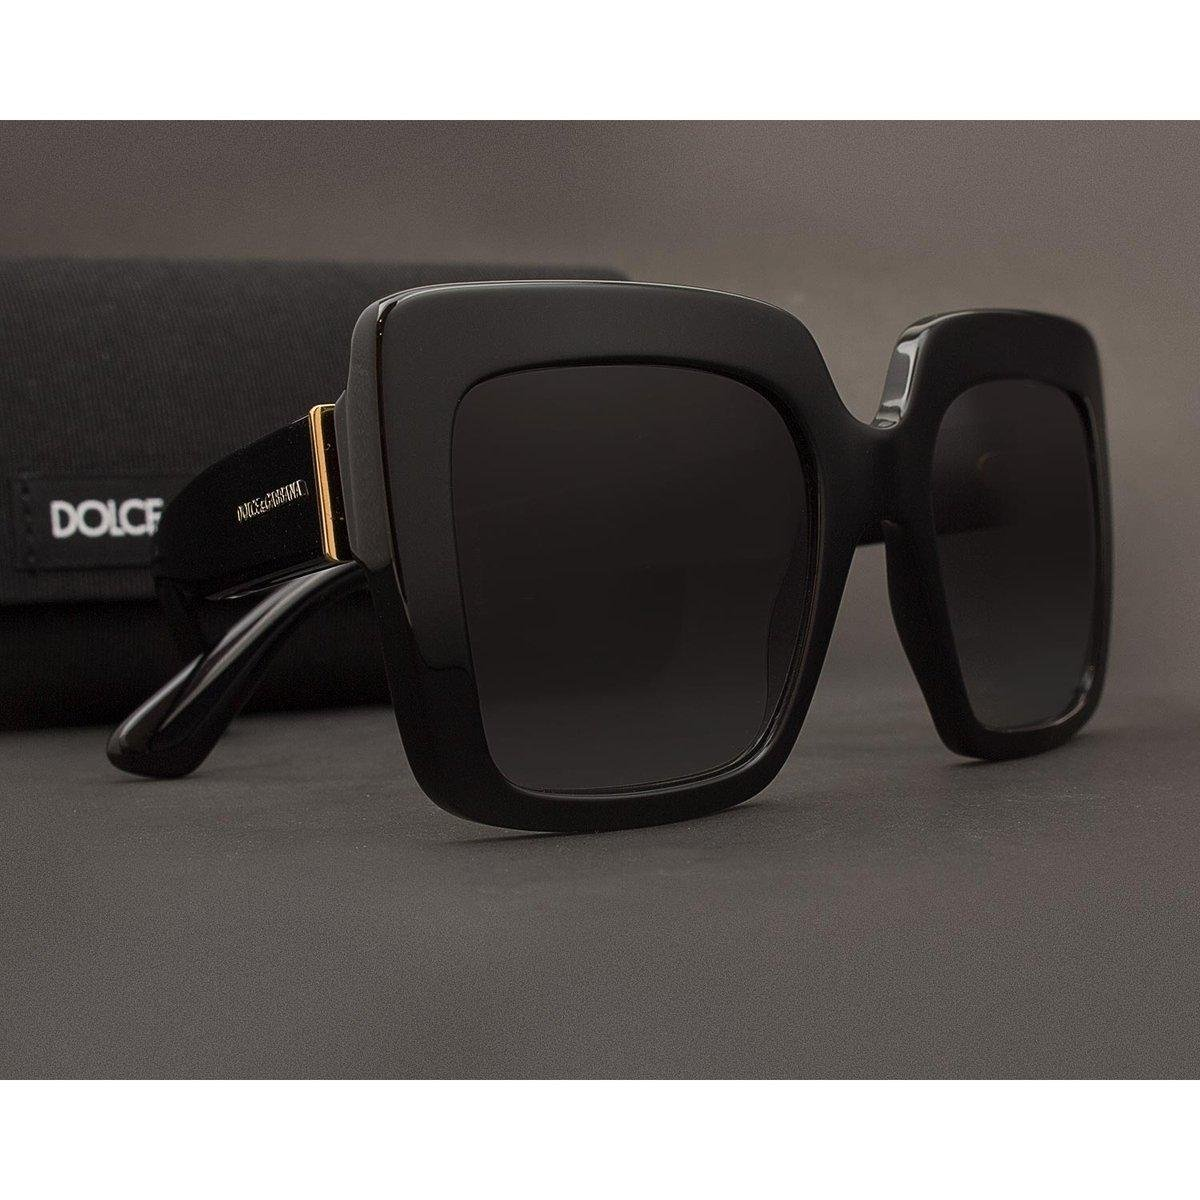 acb00688d Óculos de Sol Dolce e Gabbana DG4310 501/8G-52 | Zattini